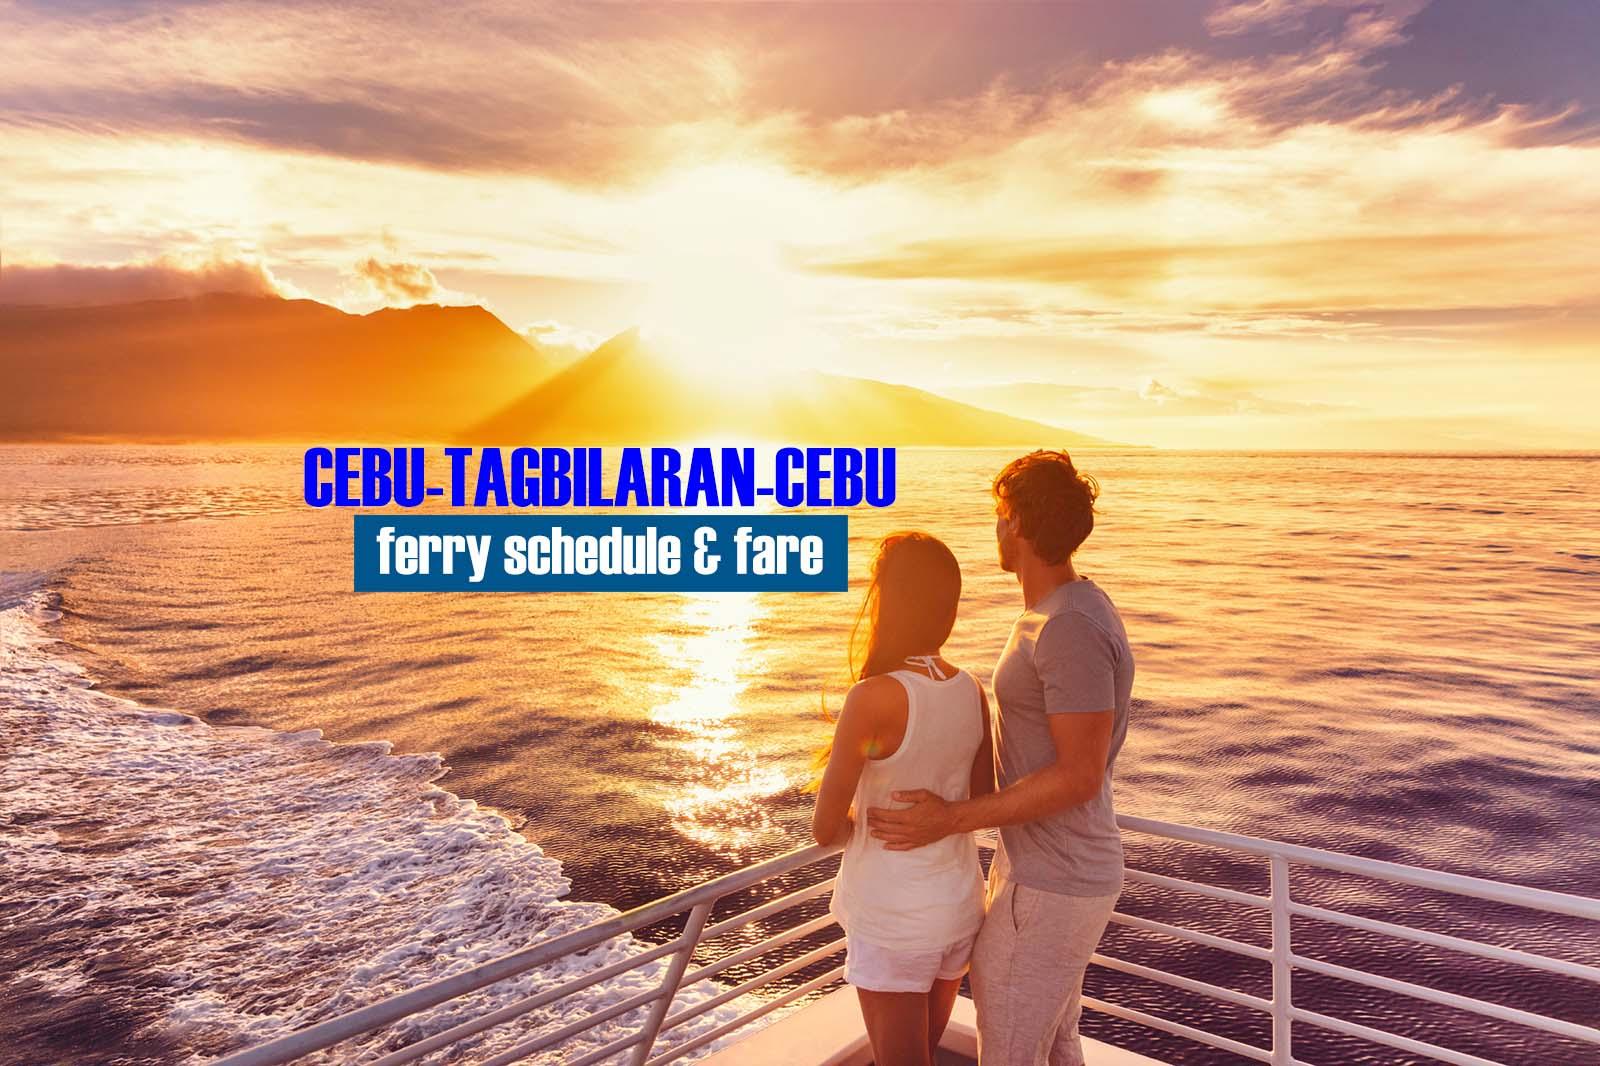 2021 Cebu to Tagbilaran Bohol Ferry Schedule and Fare Rates